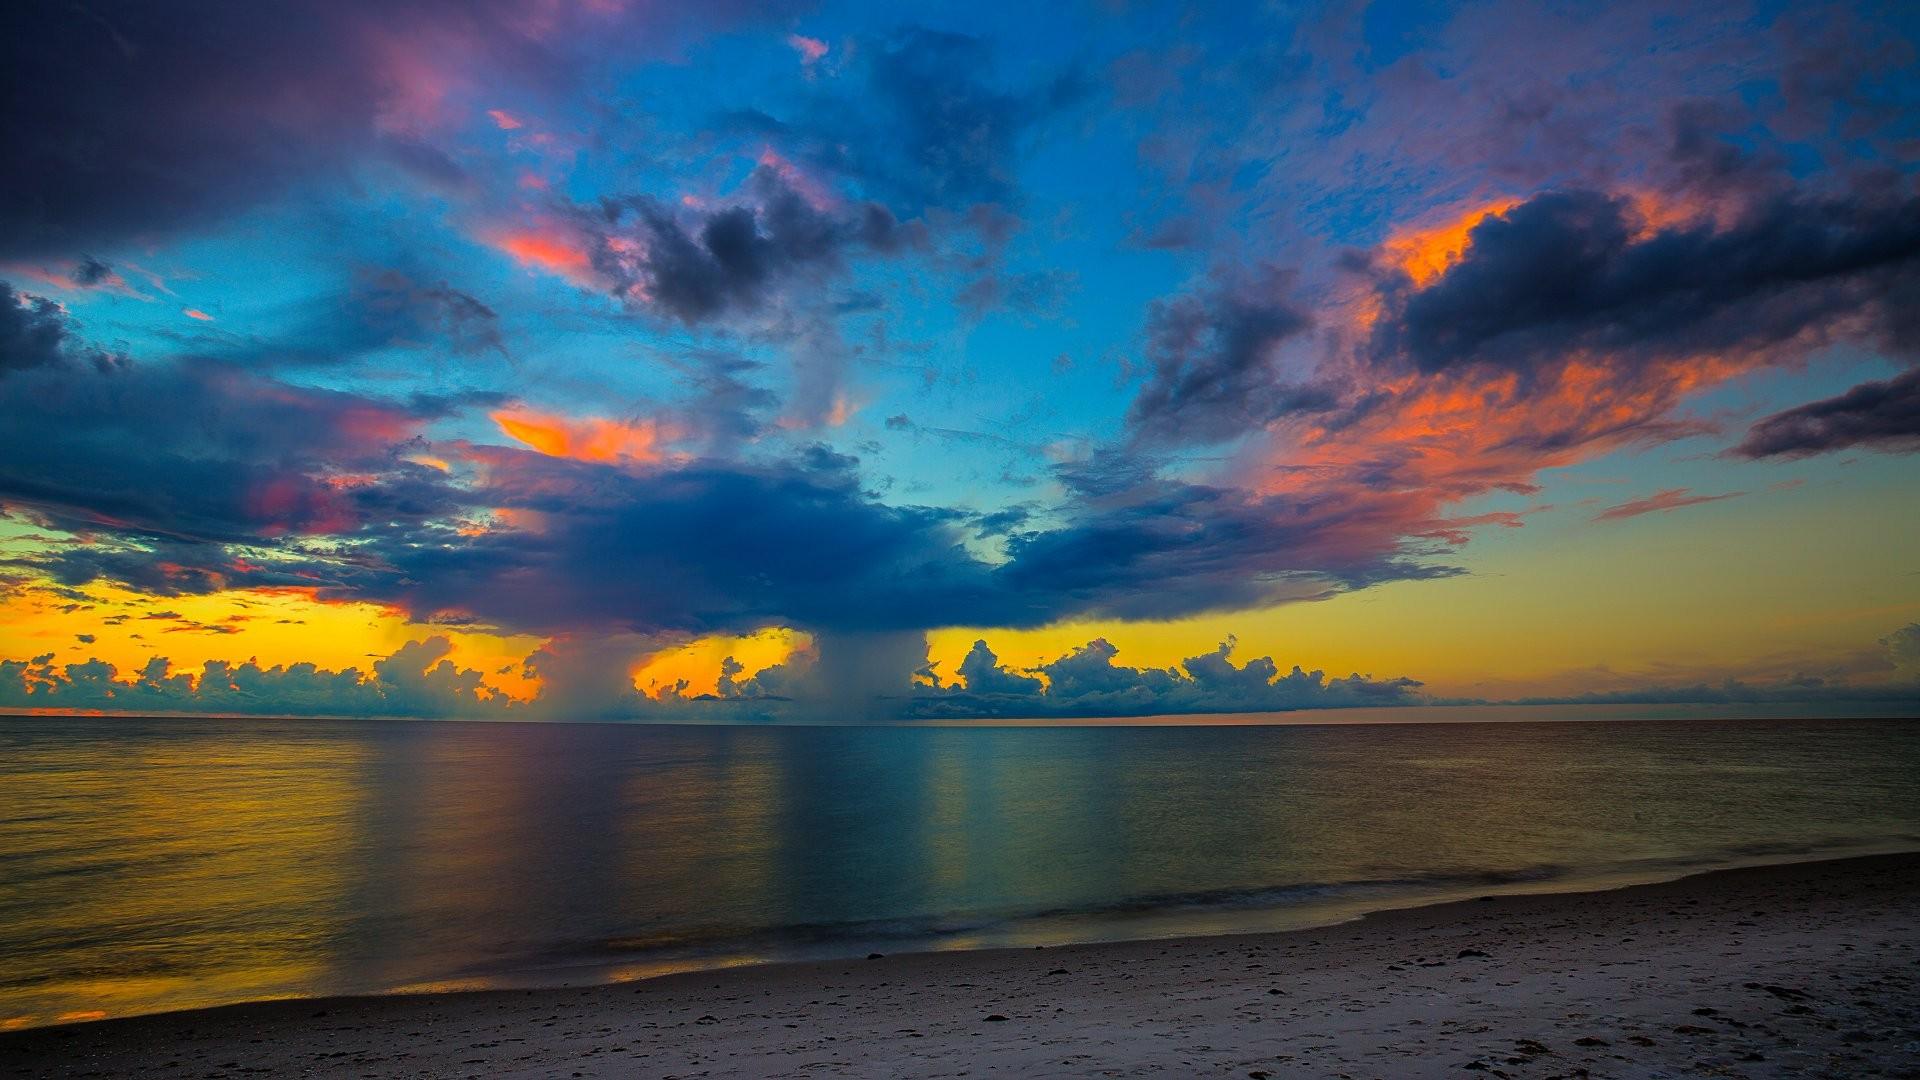 Hd Wallpapers Girls 1366x768 Florida Beach Sunset Hd Nature 4k Wallpapers Images